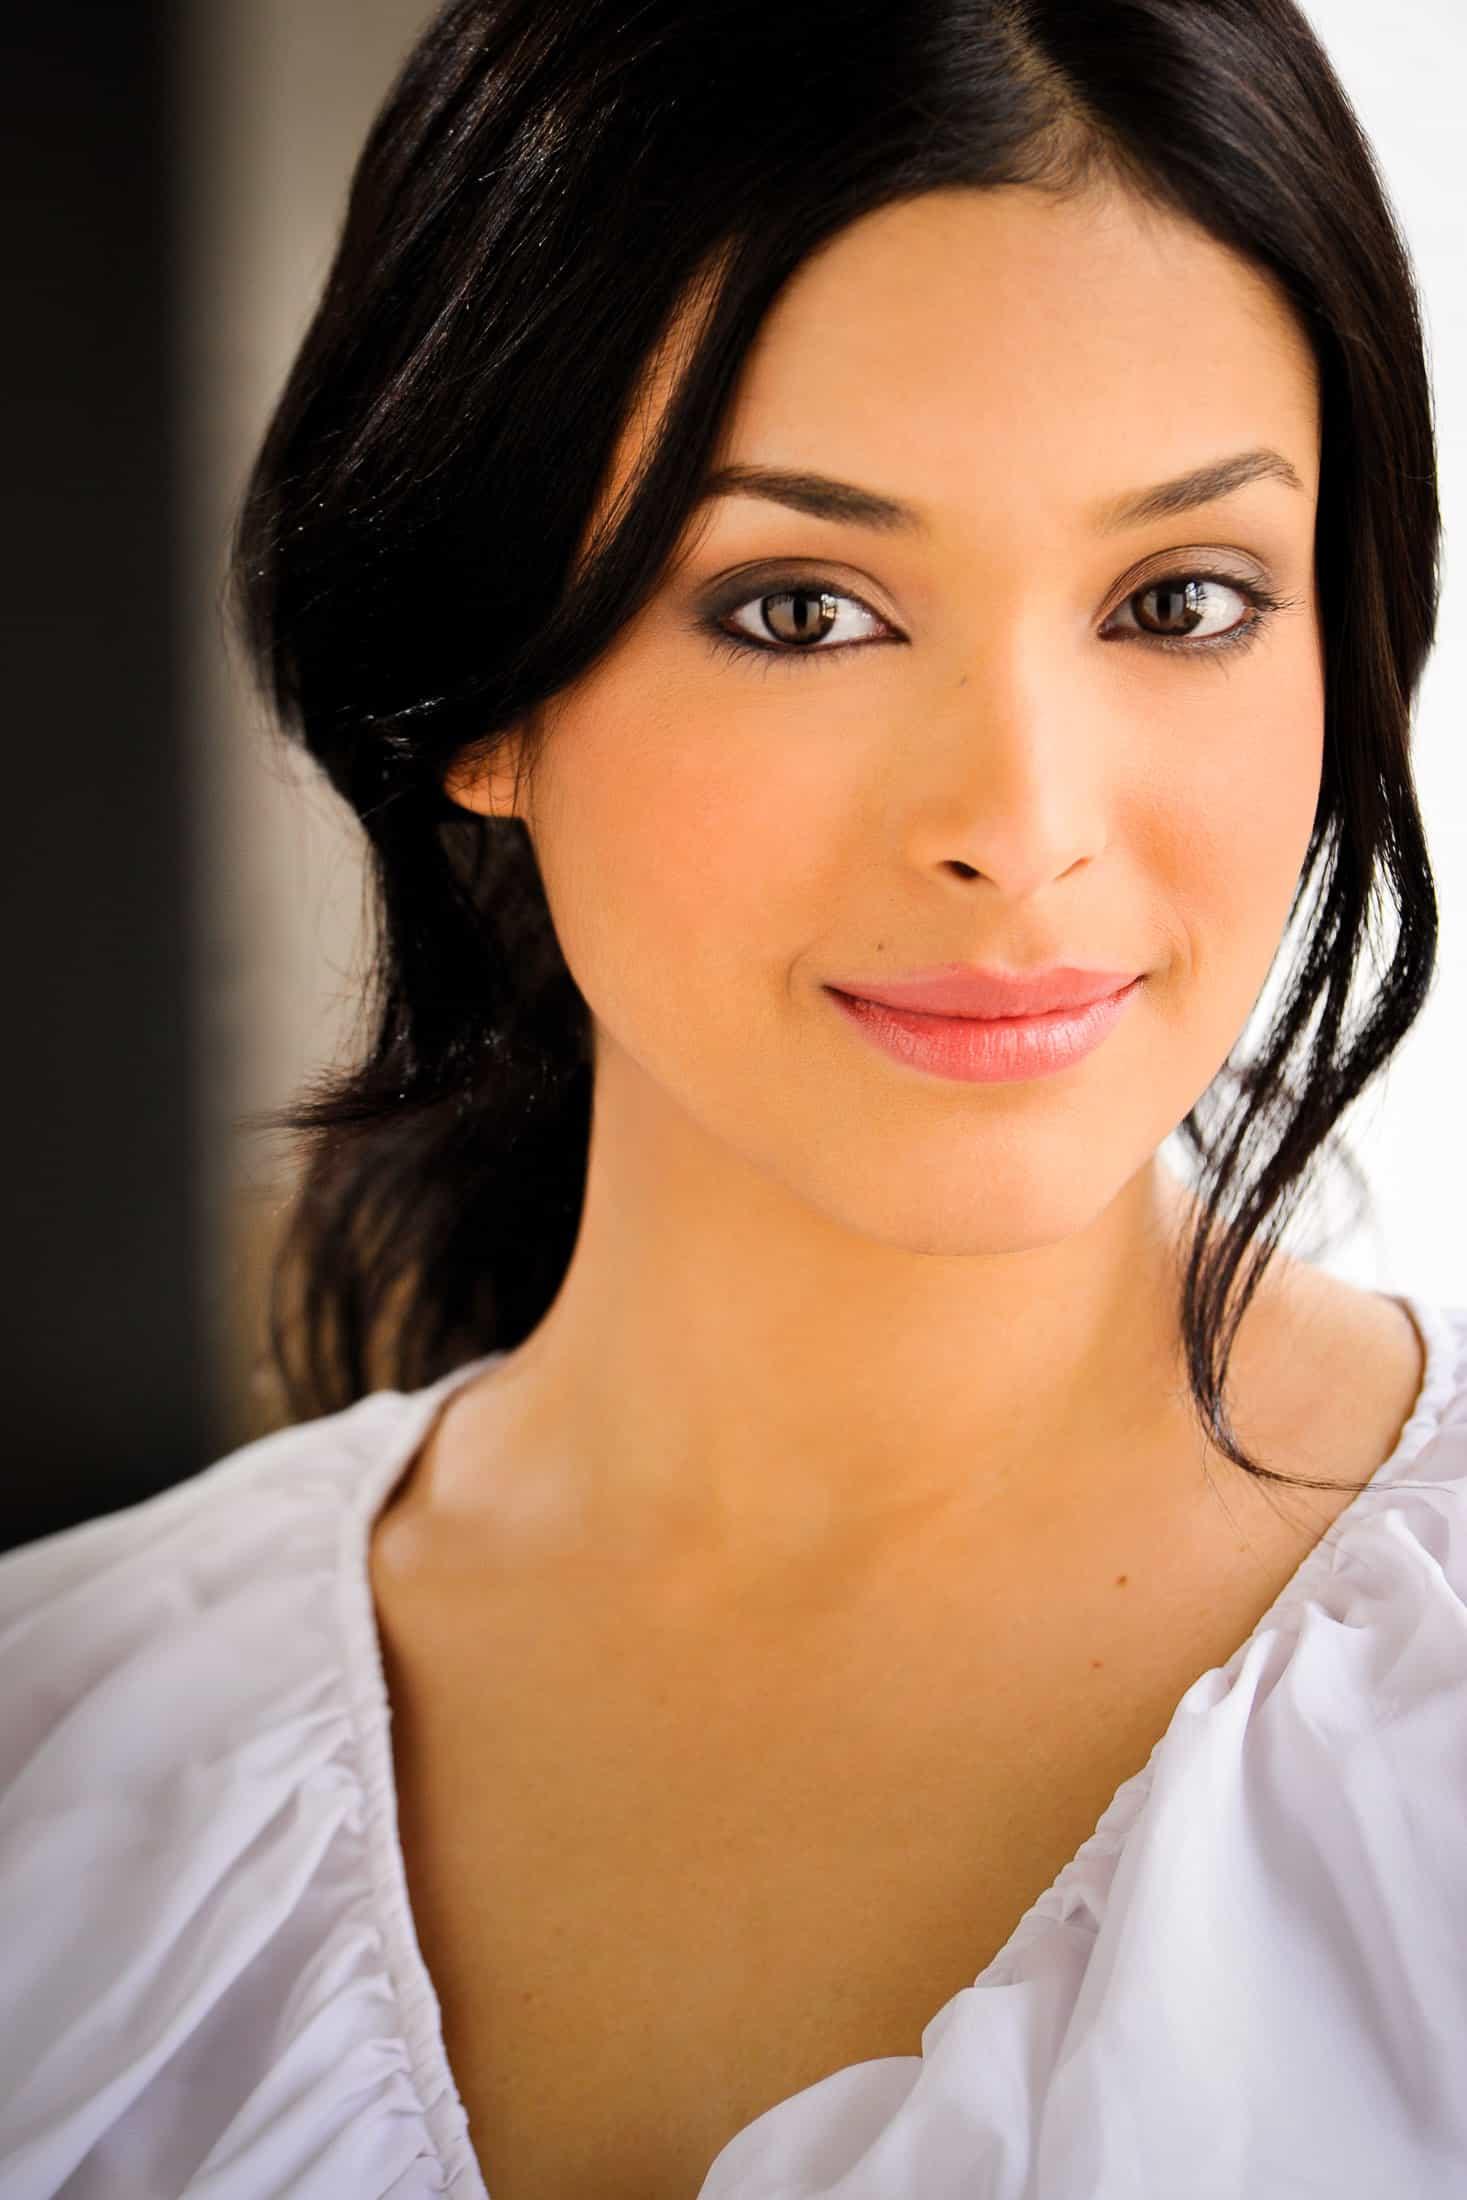 Headshots NYC - Actor Headshots Geisha M